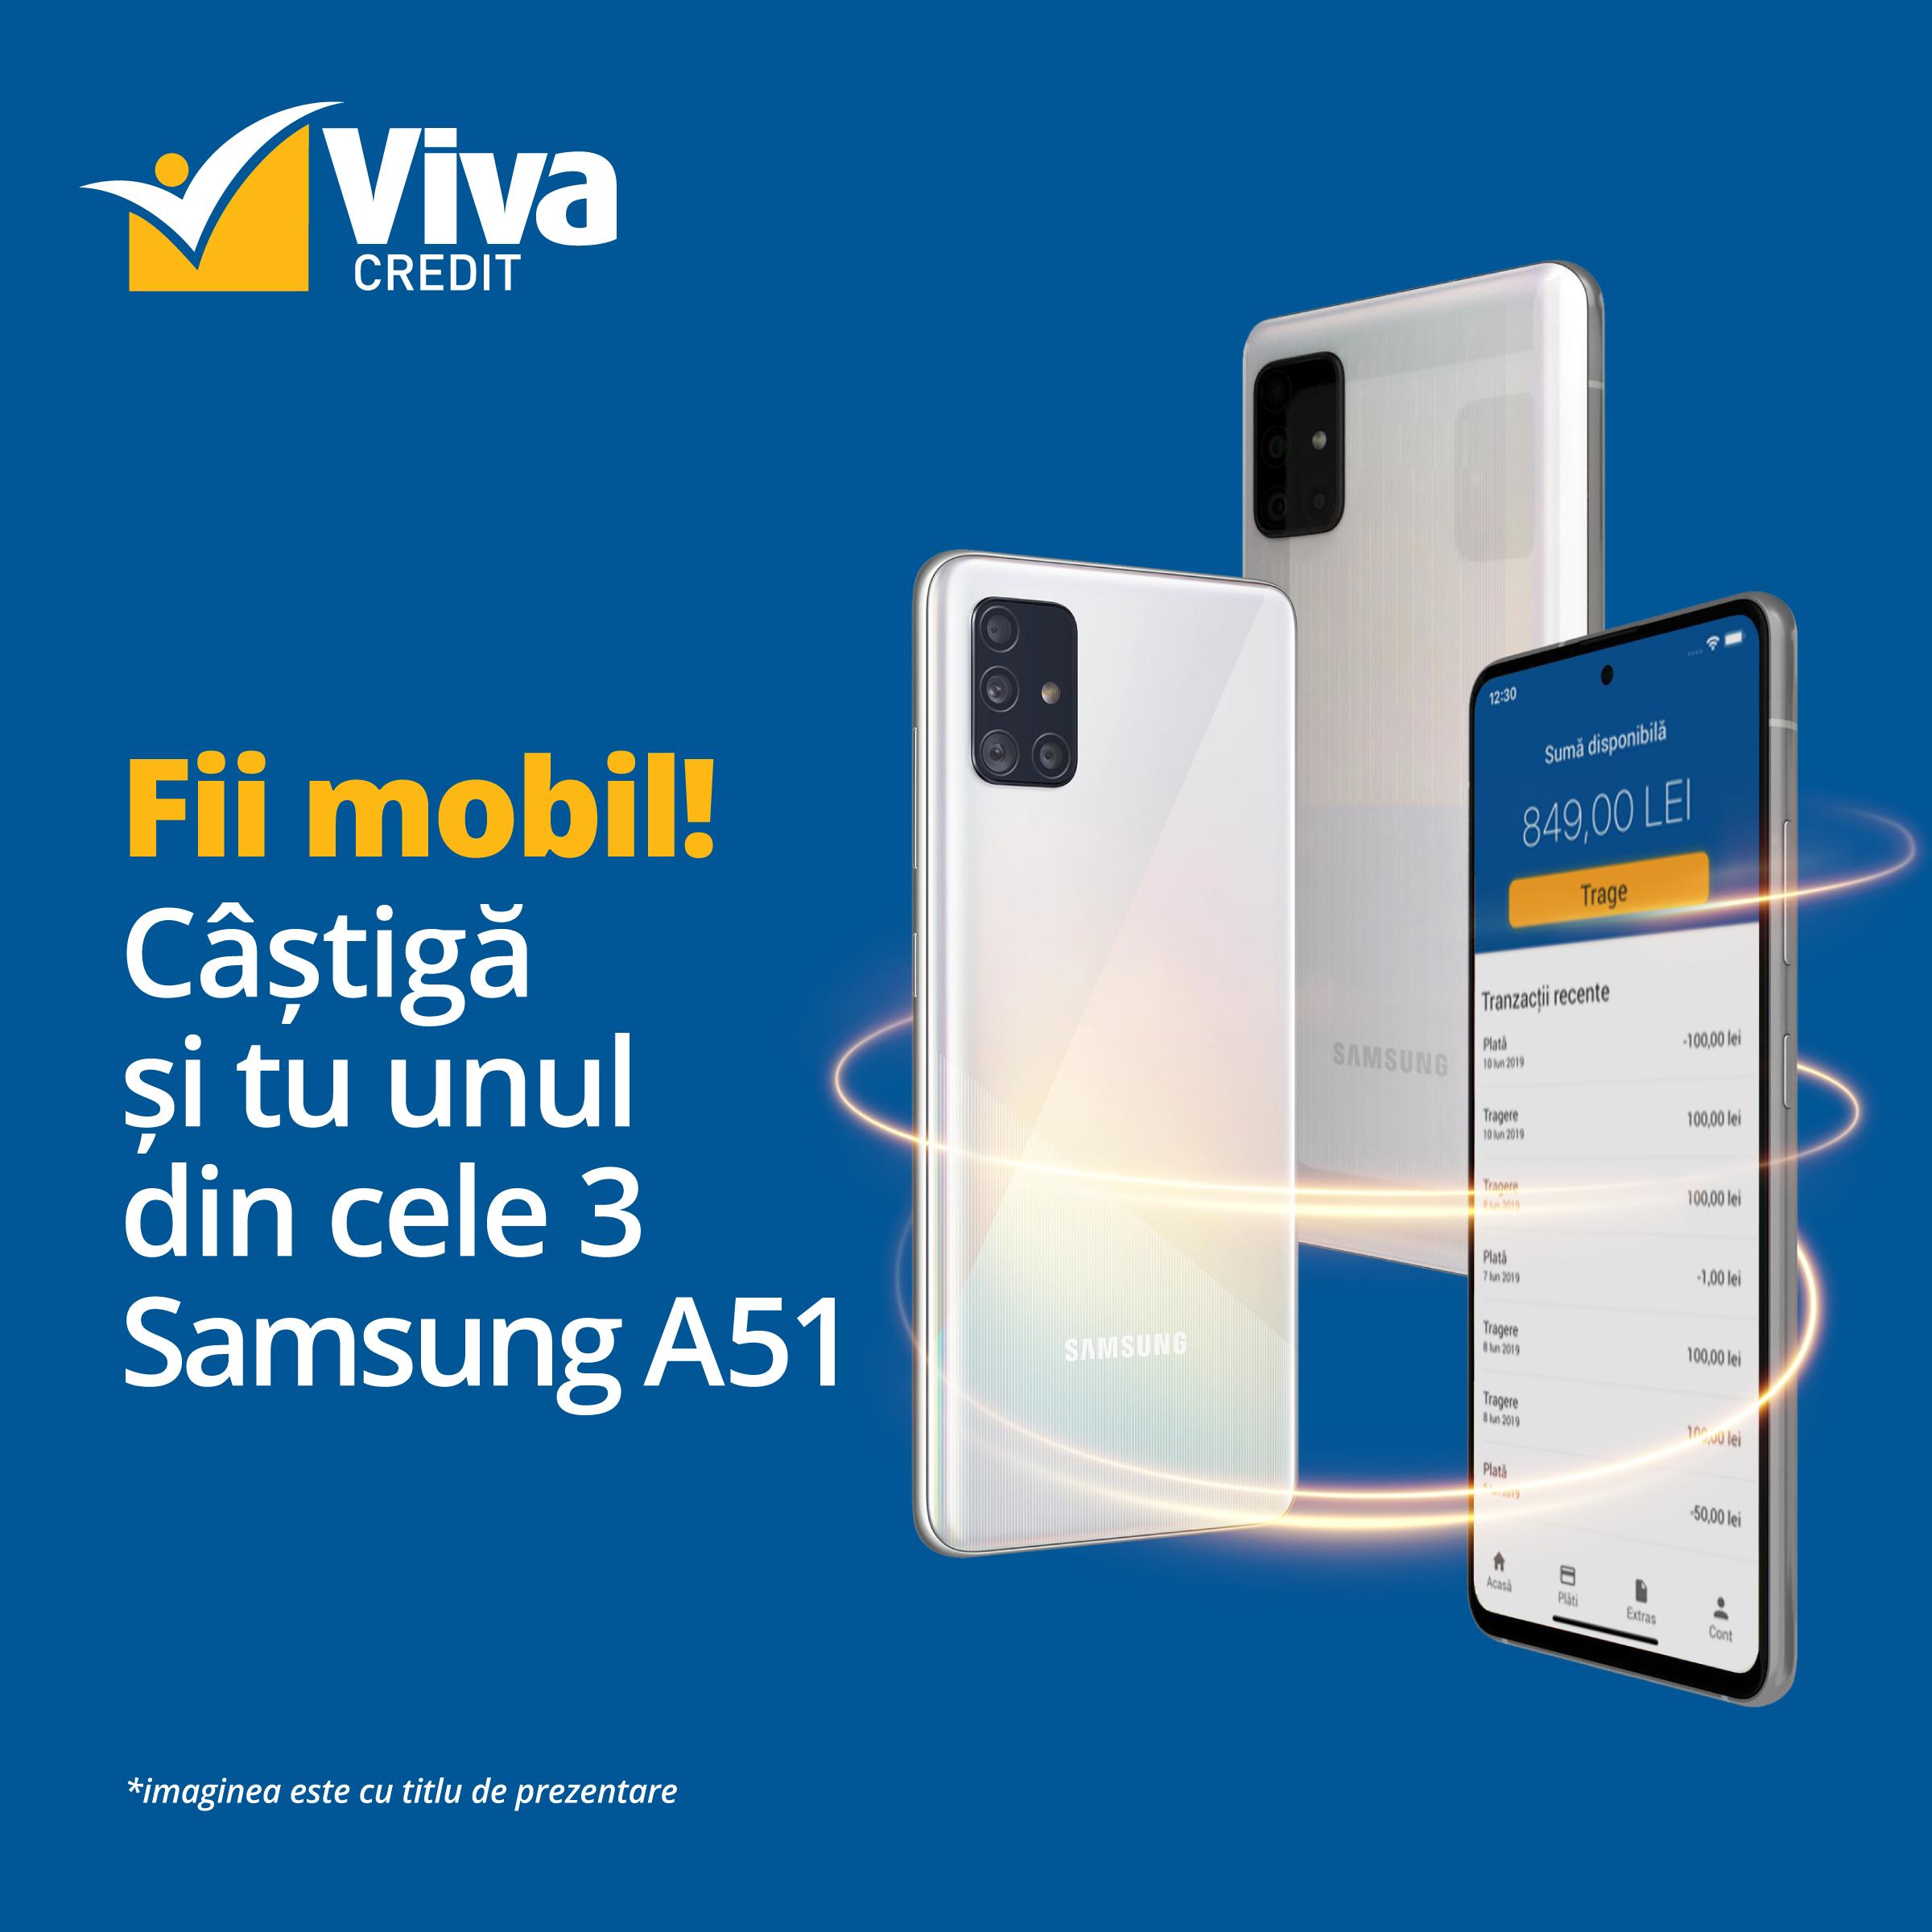 viva credit, concurs, fii mobil, aplicatie mobila, credit online